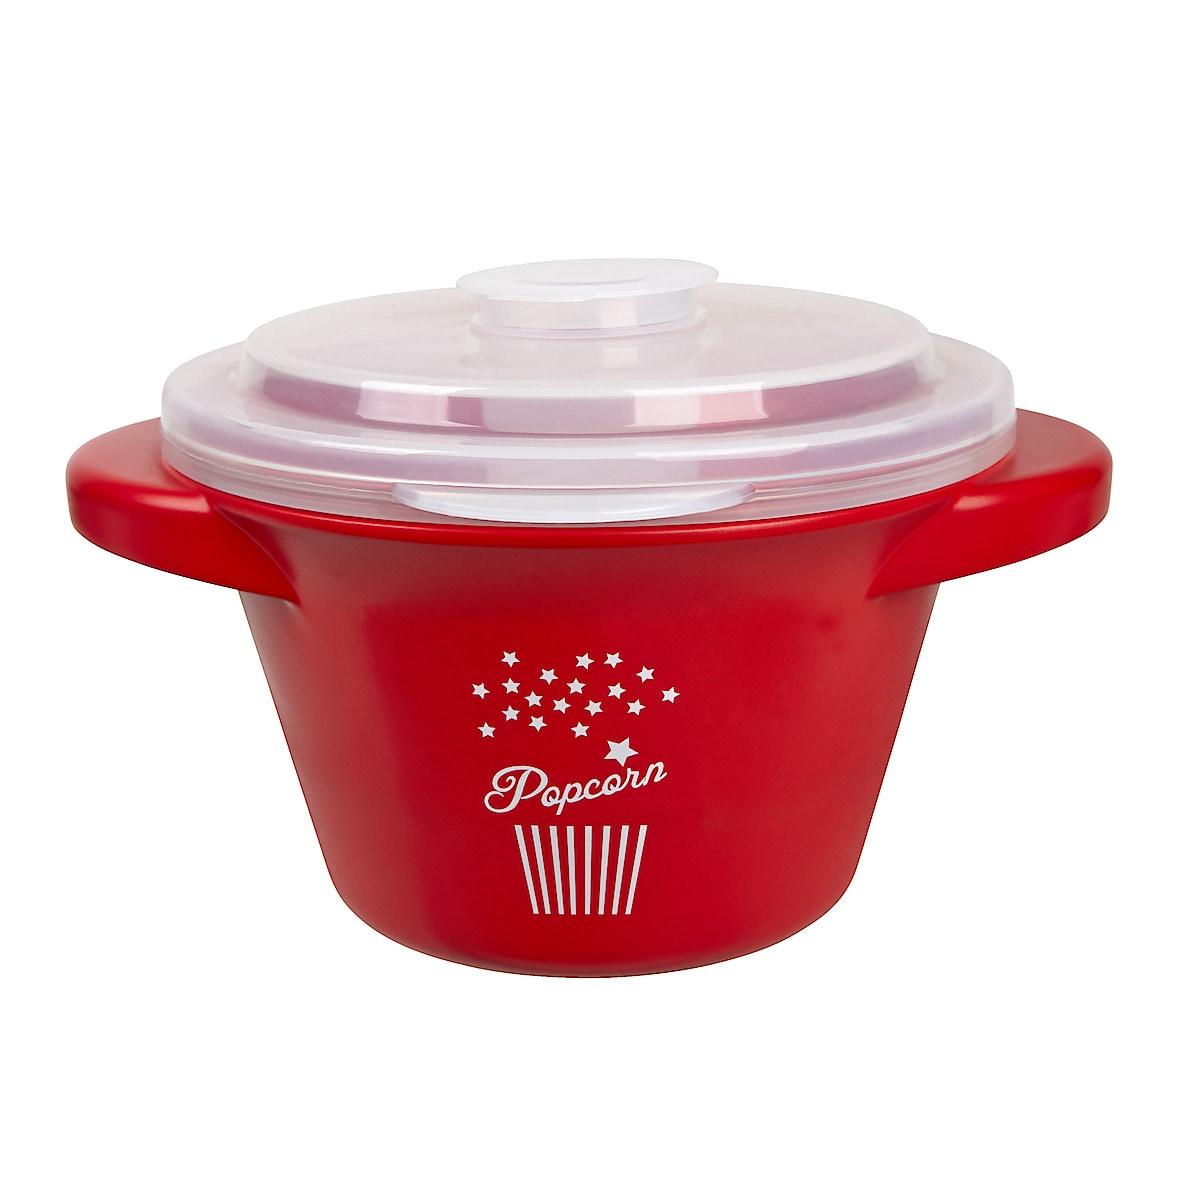 Popcorn-kulho mikroon